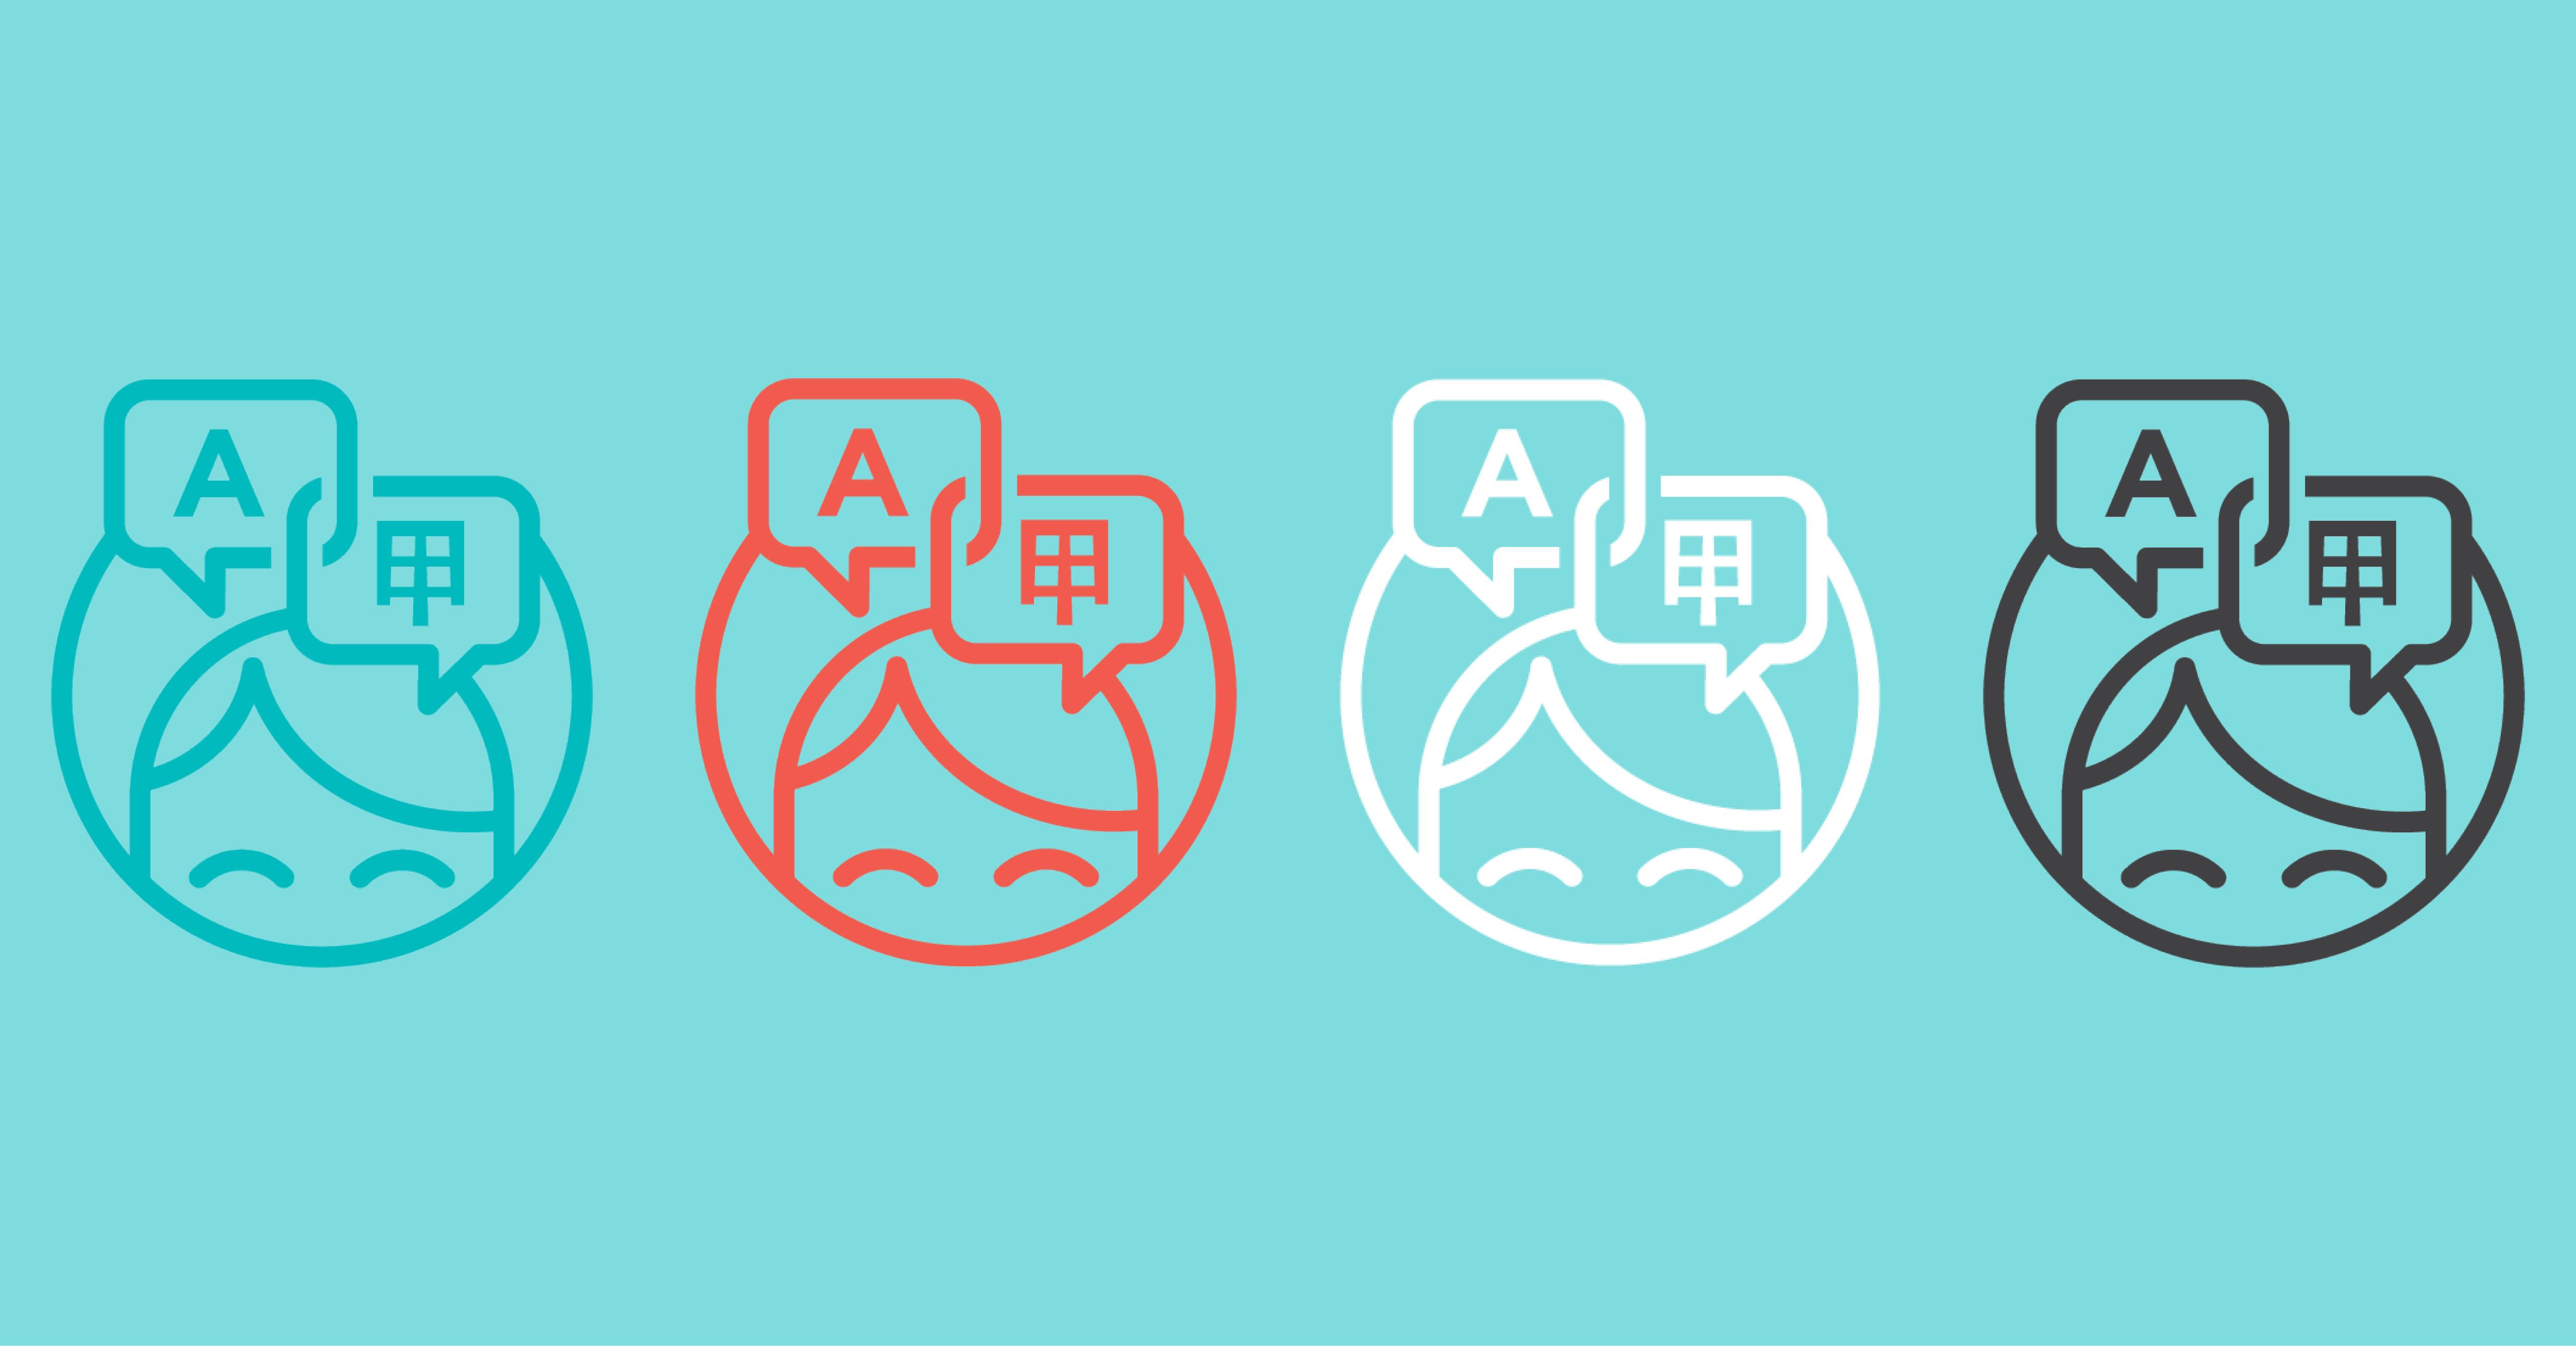 Professional human translation icons